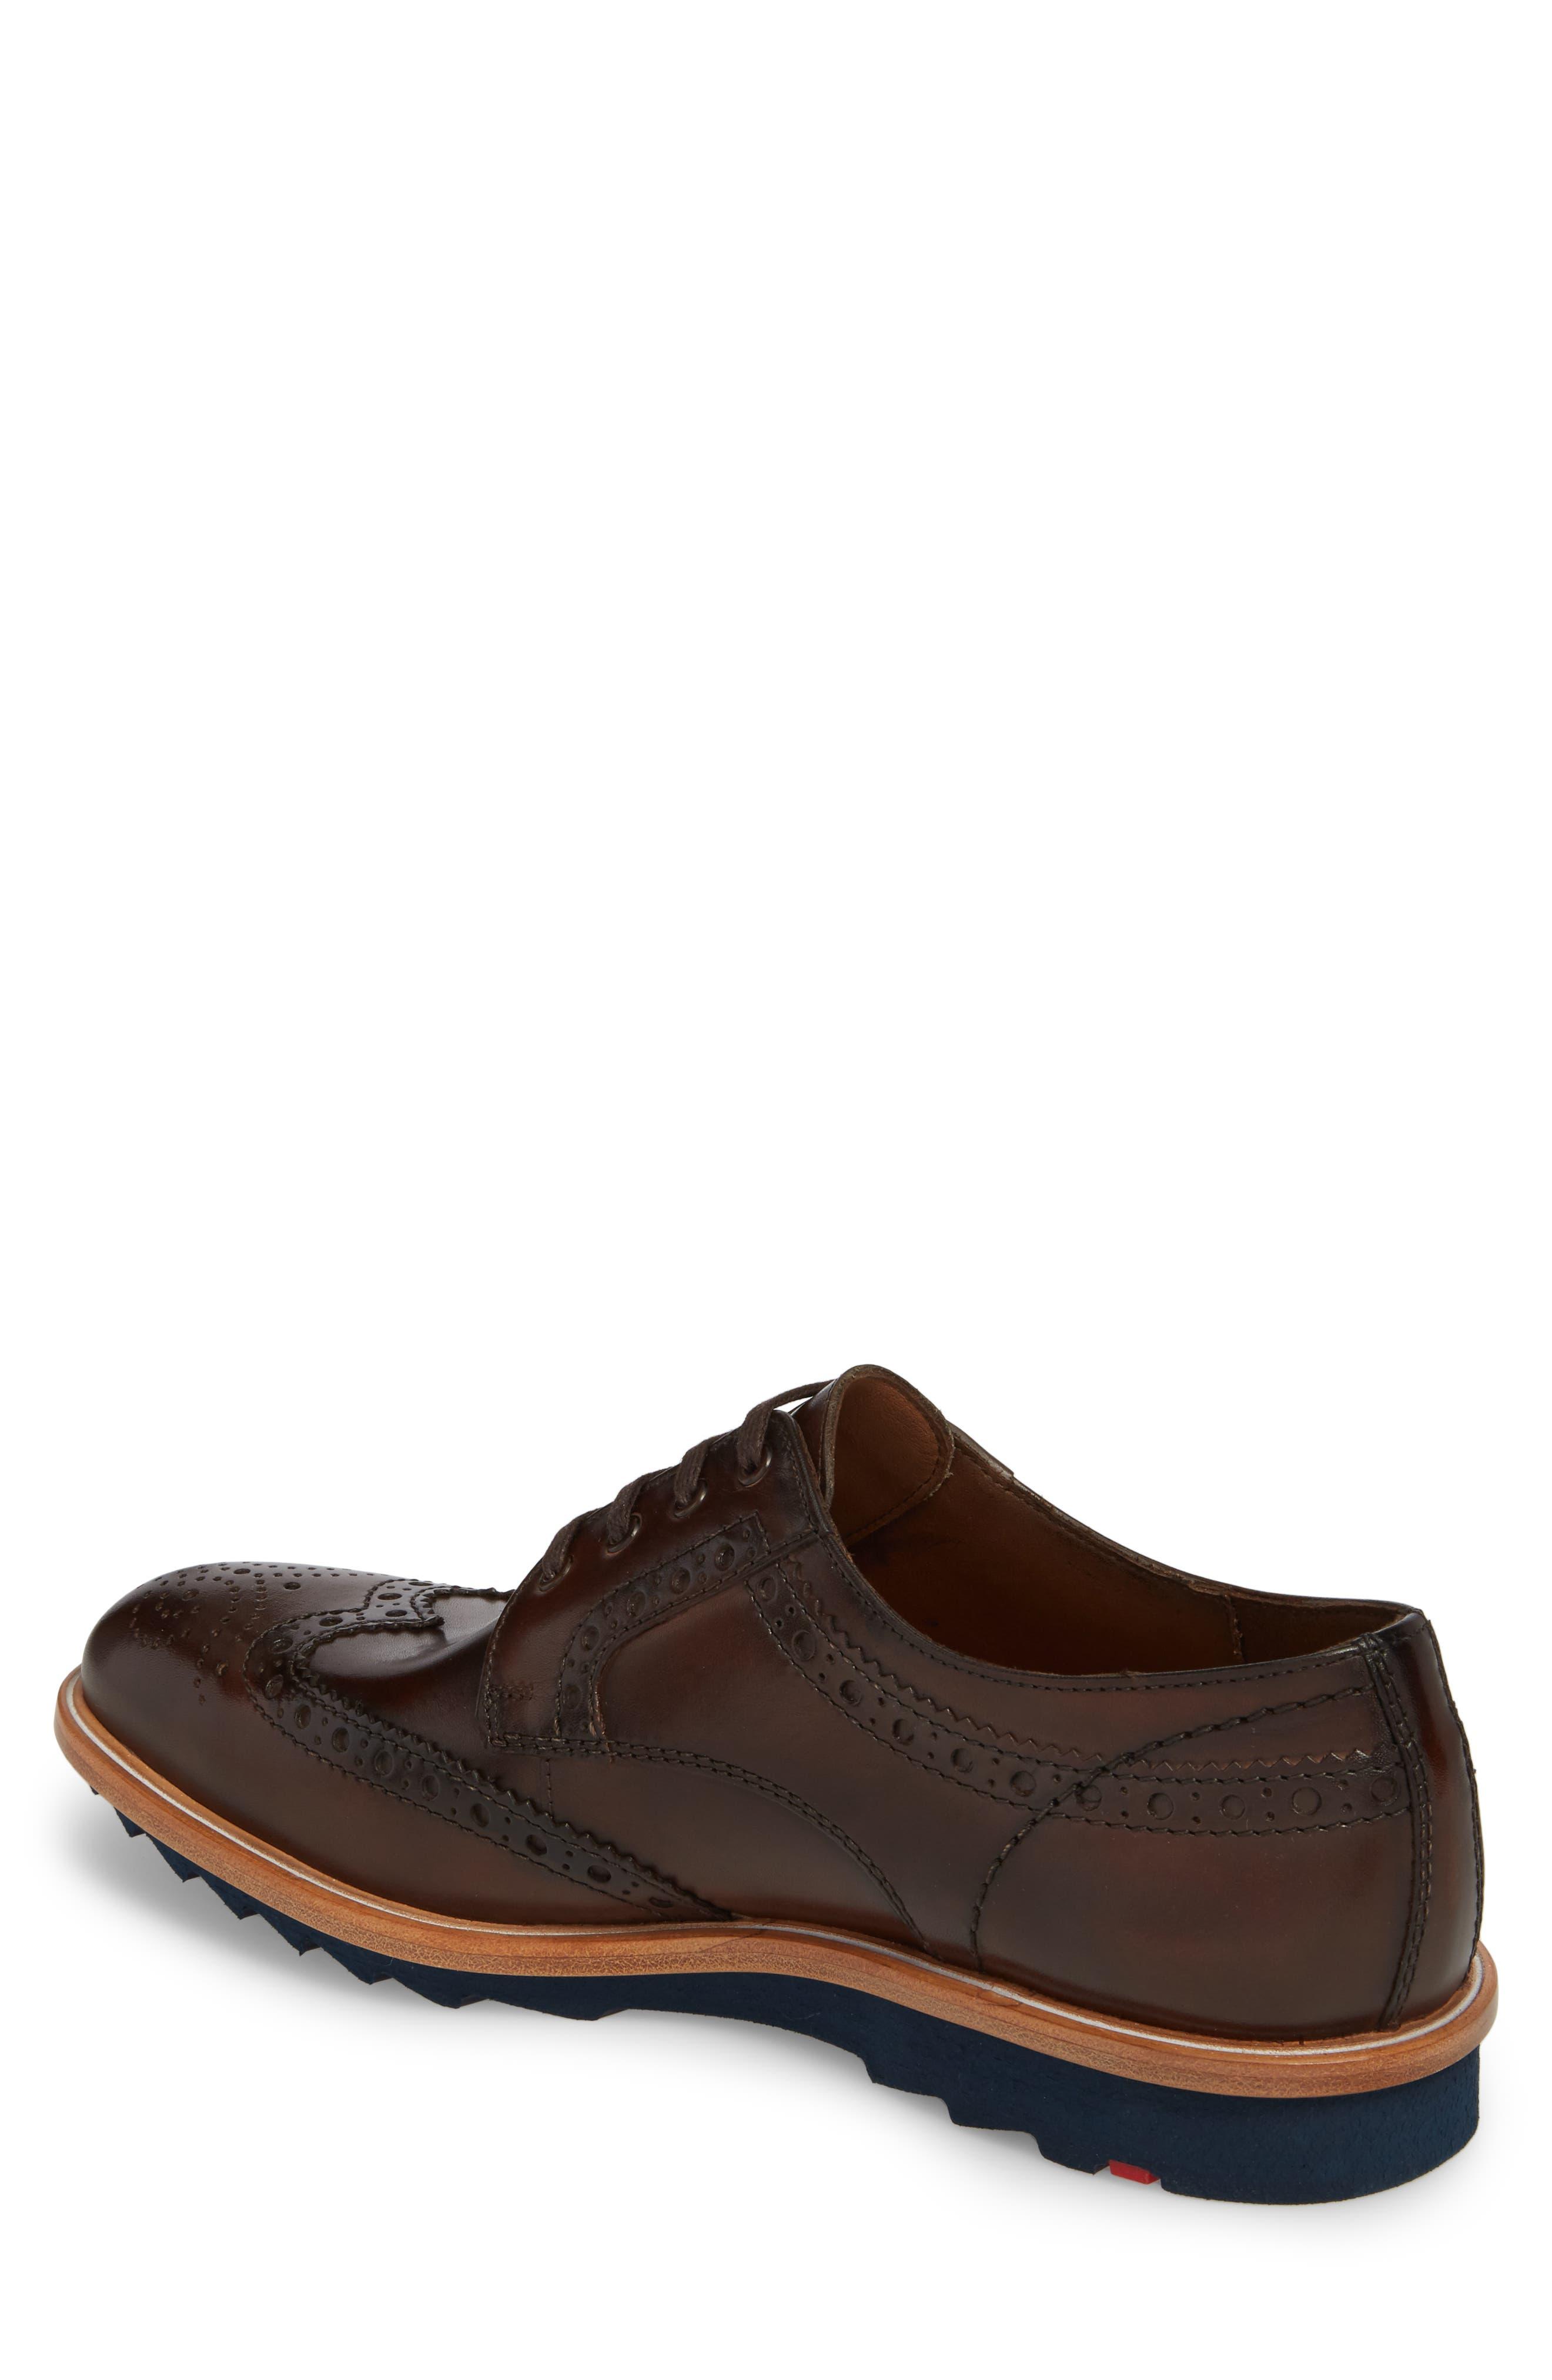 Fairbanks Wingtip,                             Alternate thumbnail 2, color,                             Brown Leather